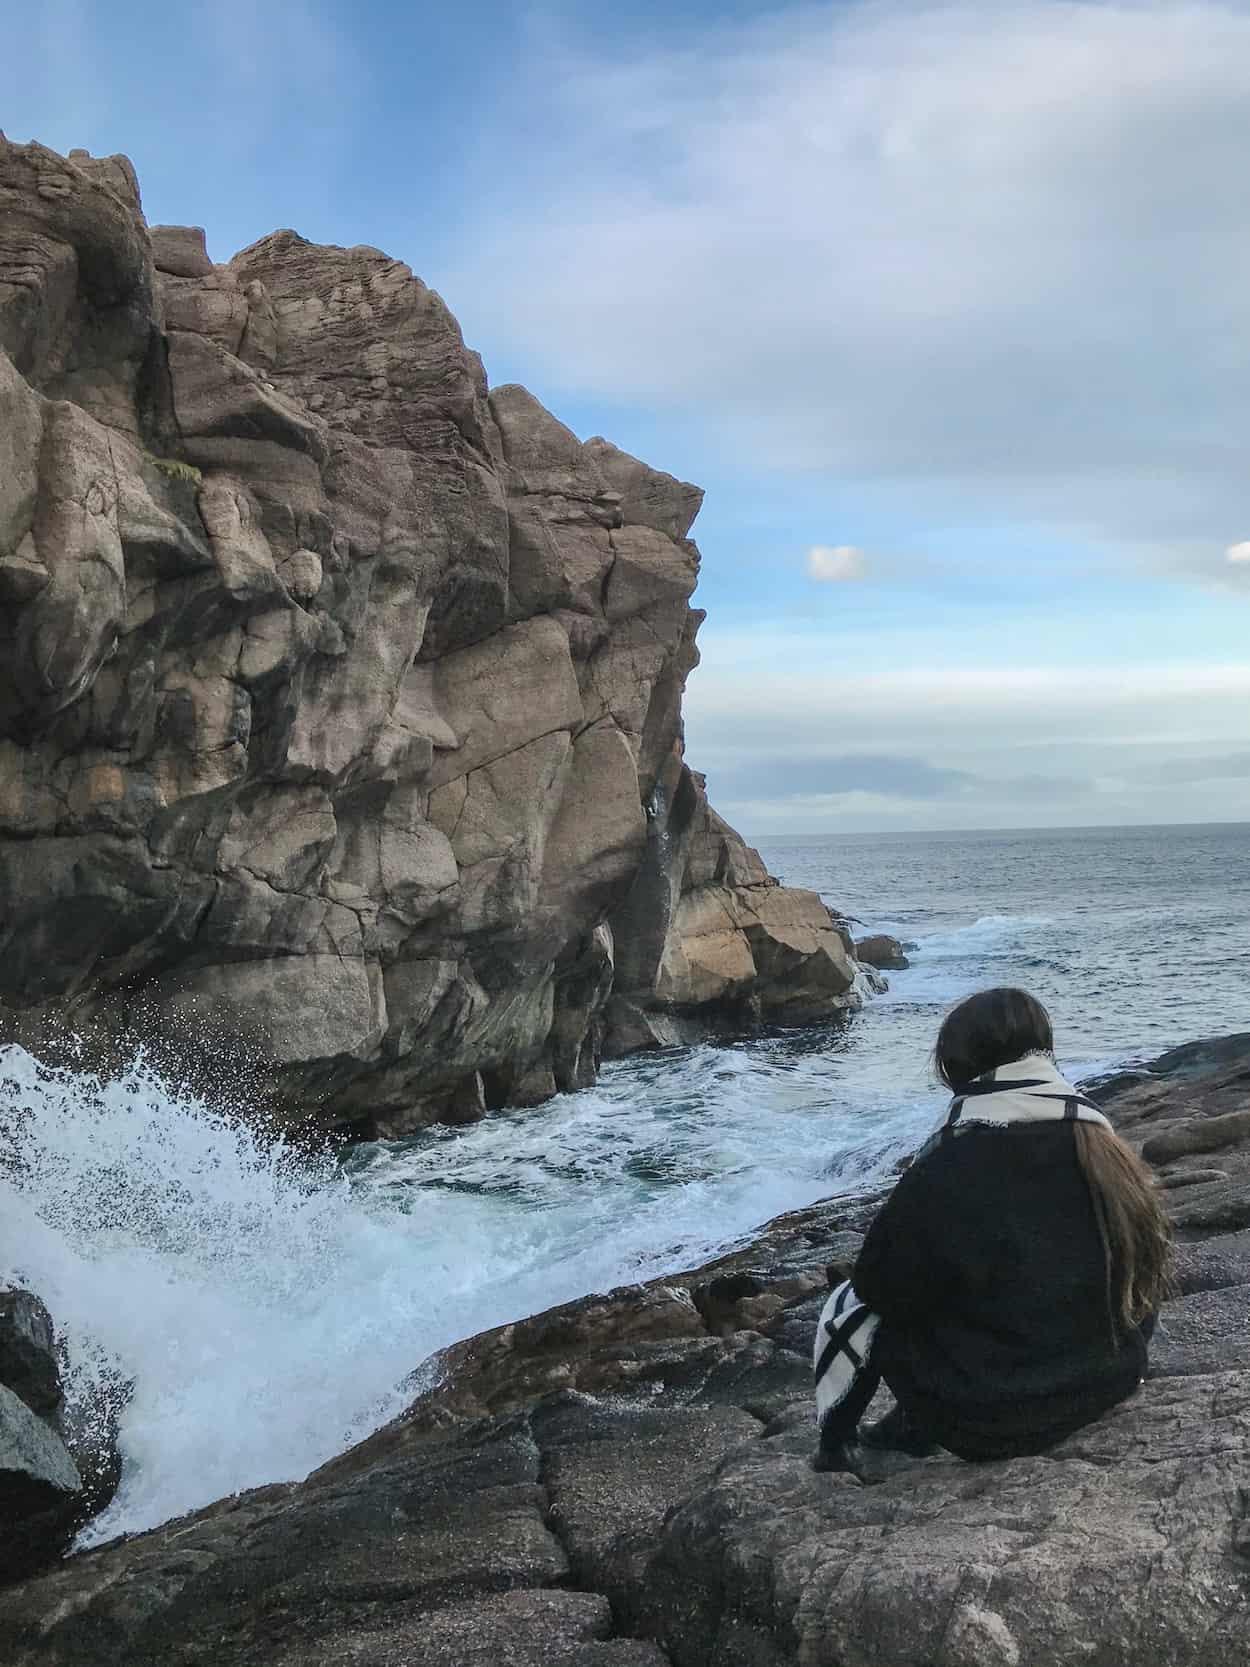 Historic Cape Spear in St. John's, Newfoundland